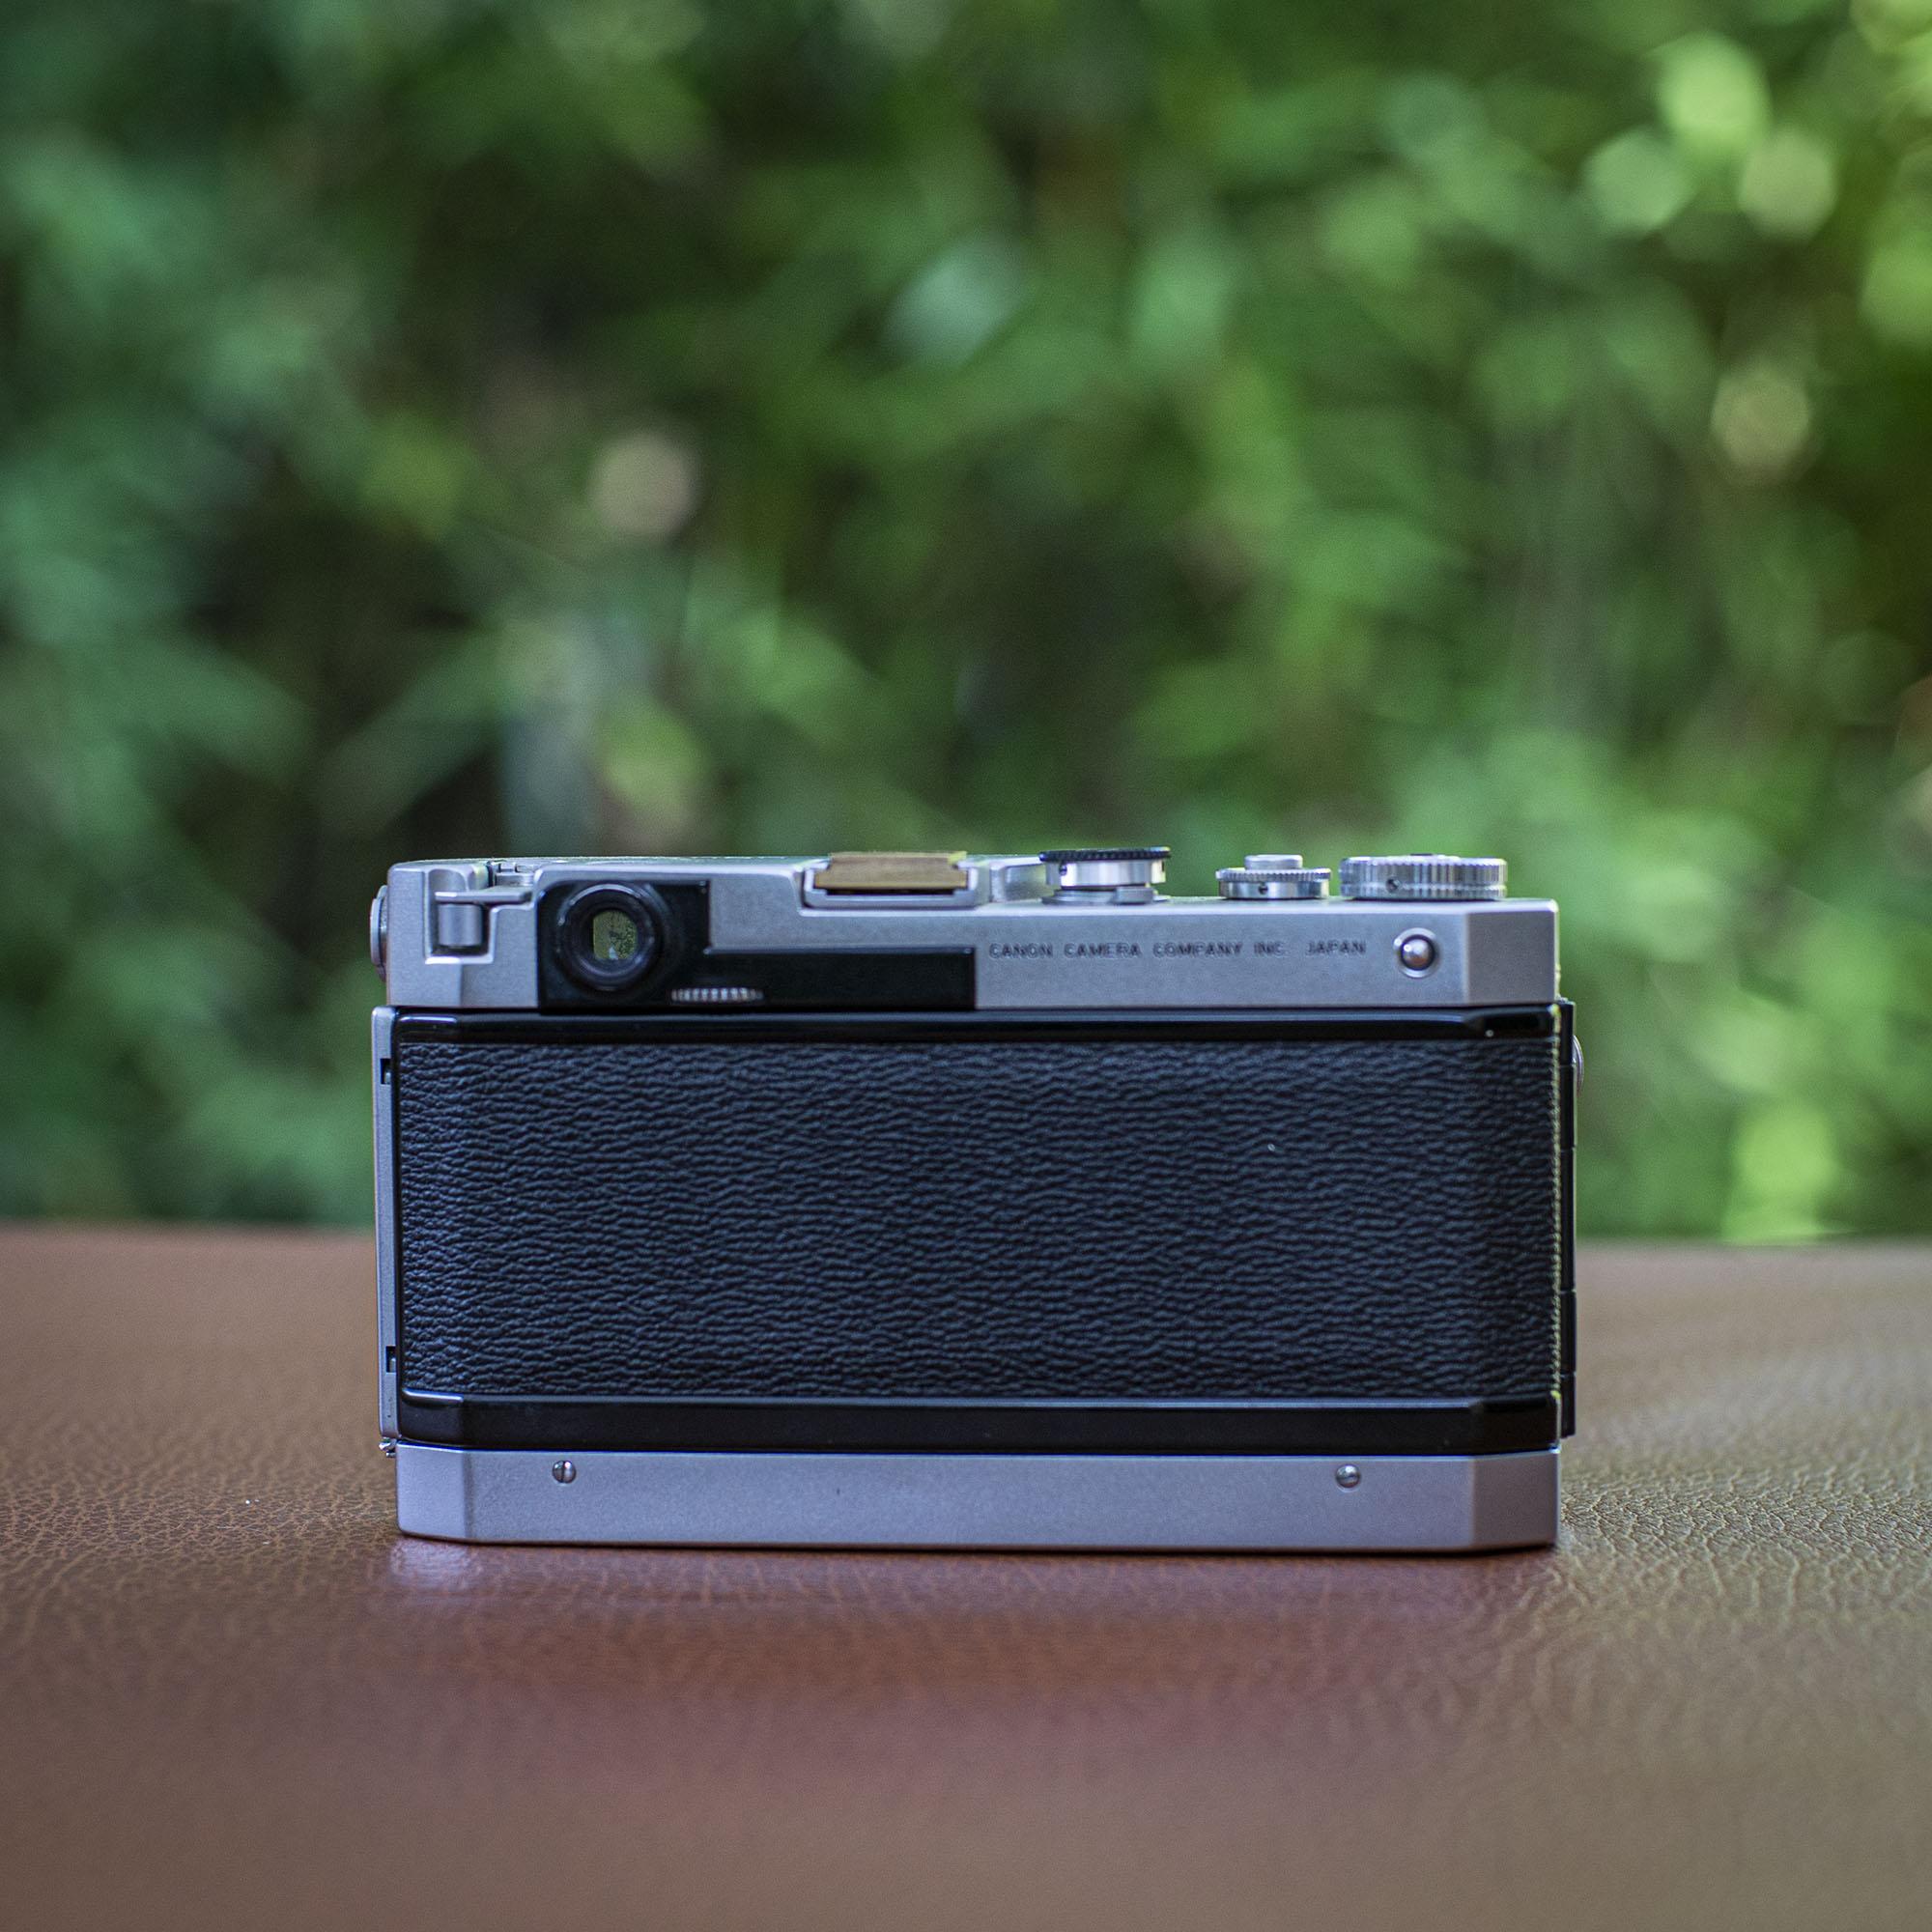 Canon VT de luxe back of the camera